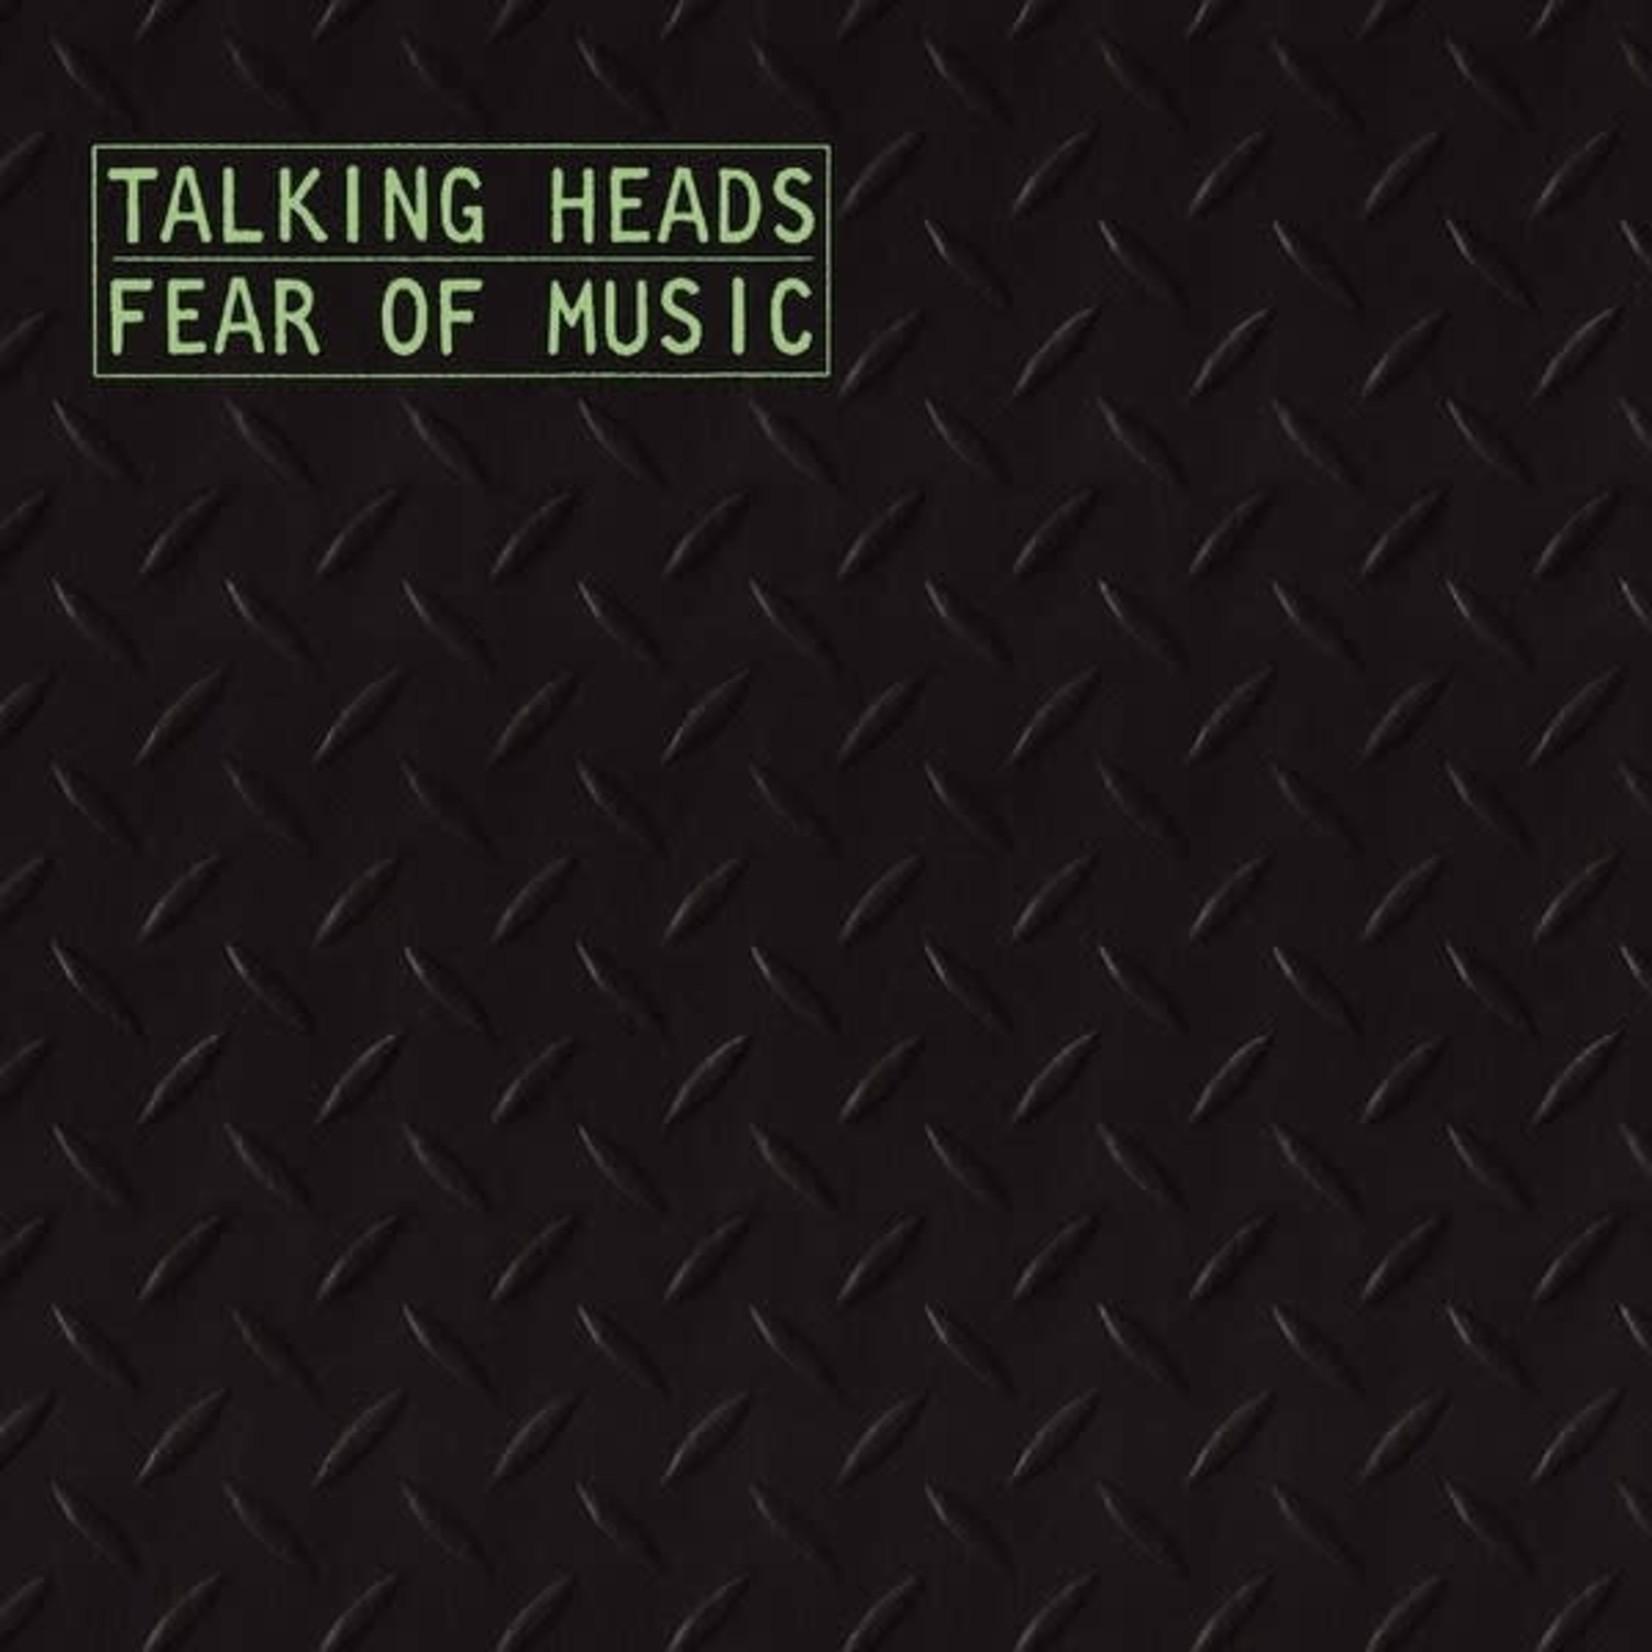 [New] Talking Heads: Fear Of Music